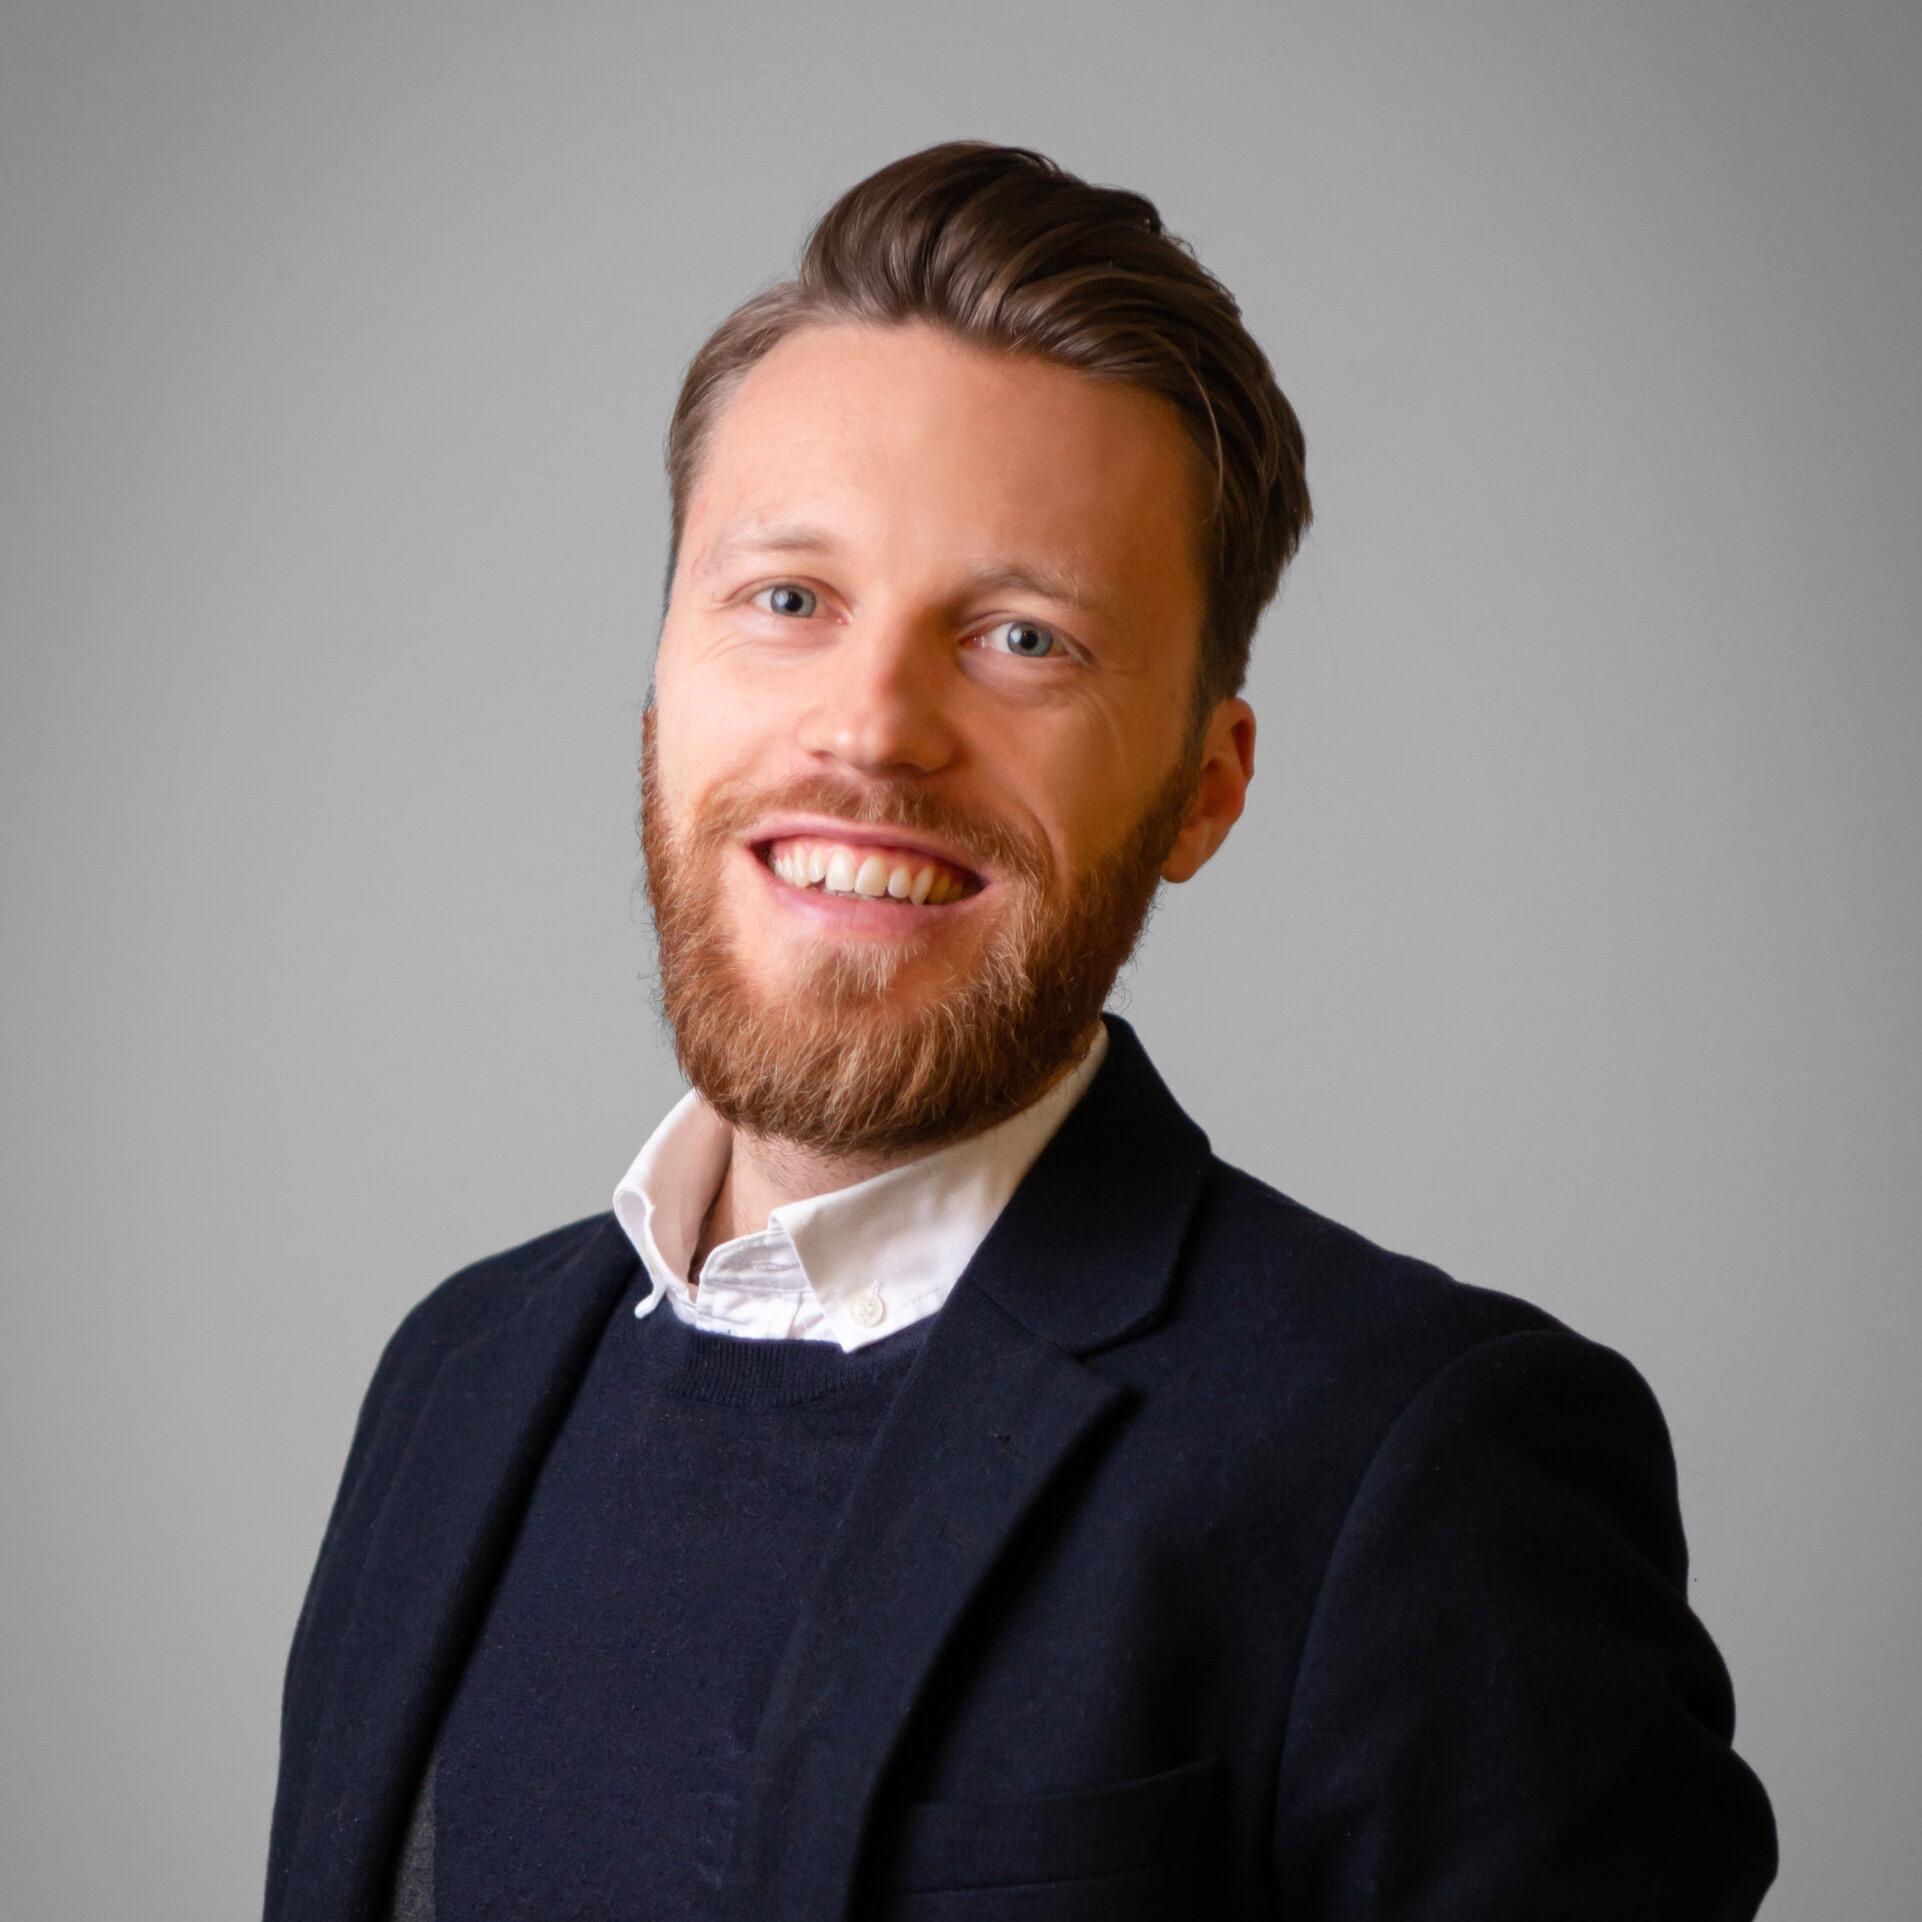 Mats Brandt, recruiter ved MDE i Bergen